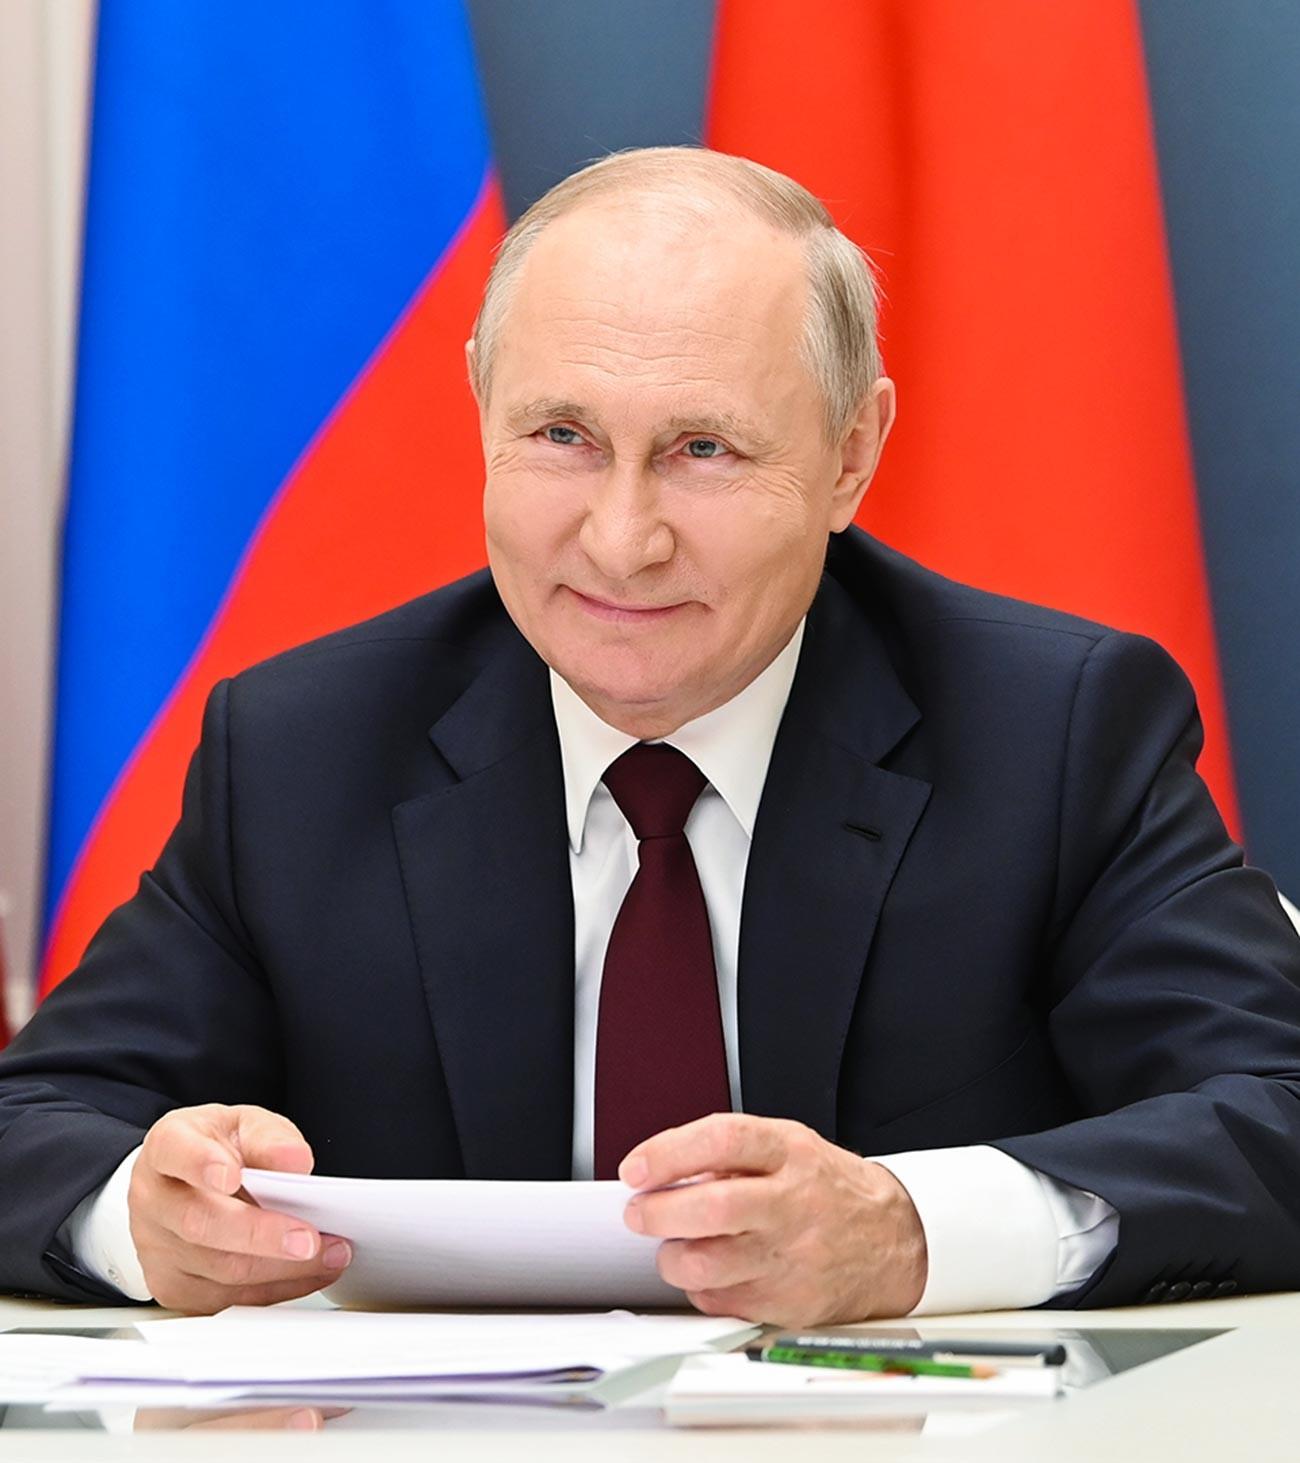 Presiden Rusia Vladimir Putin selama konferensi video dengan Presiden Tiongkok Xi Jinping, 28 Juni 2021.